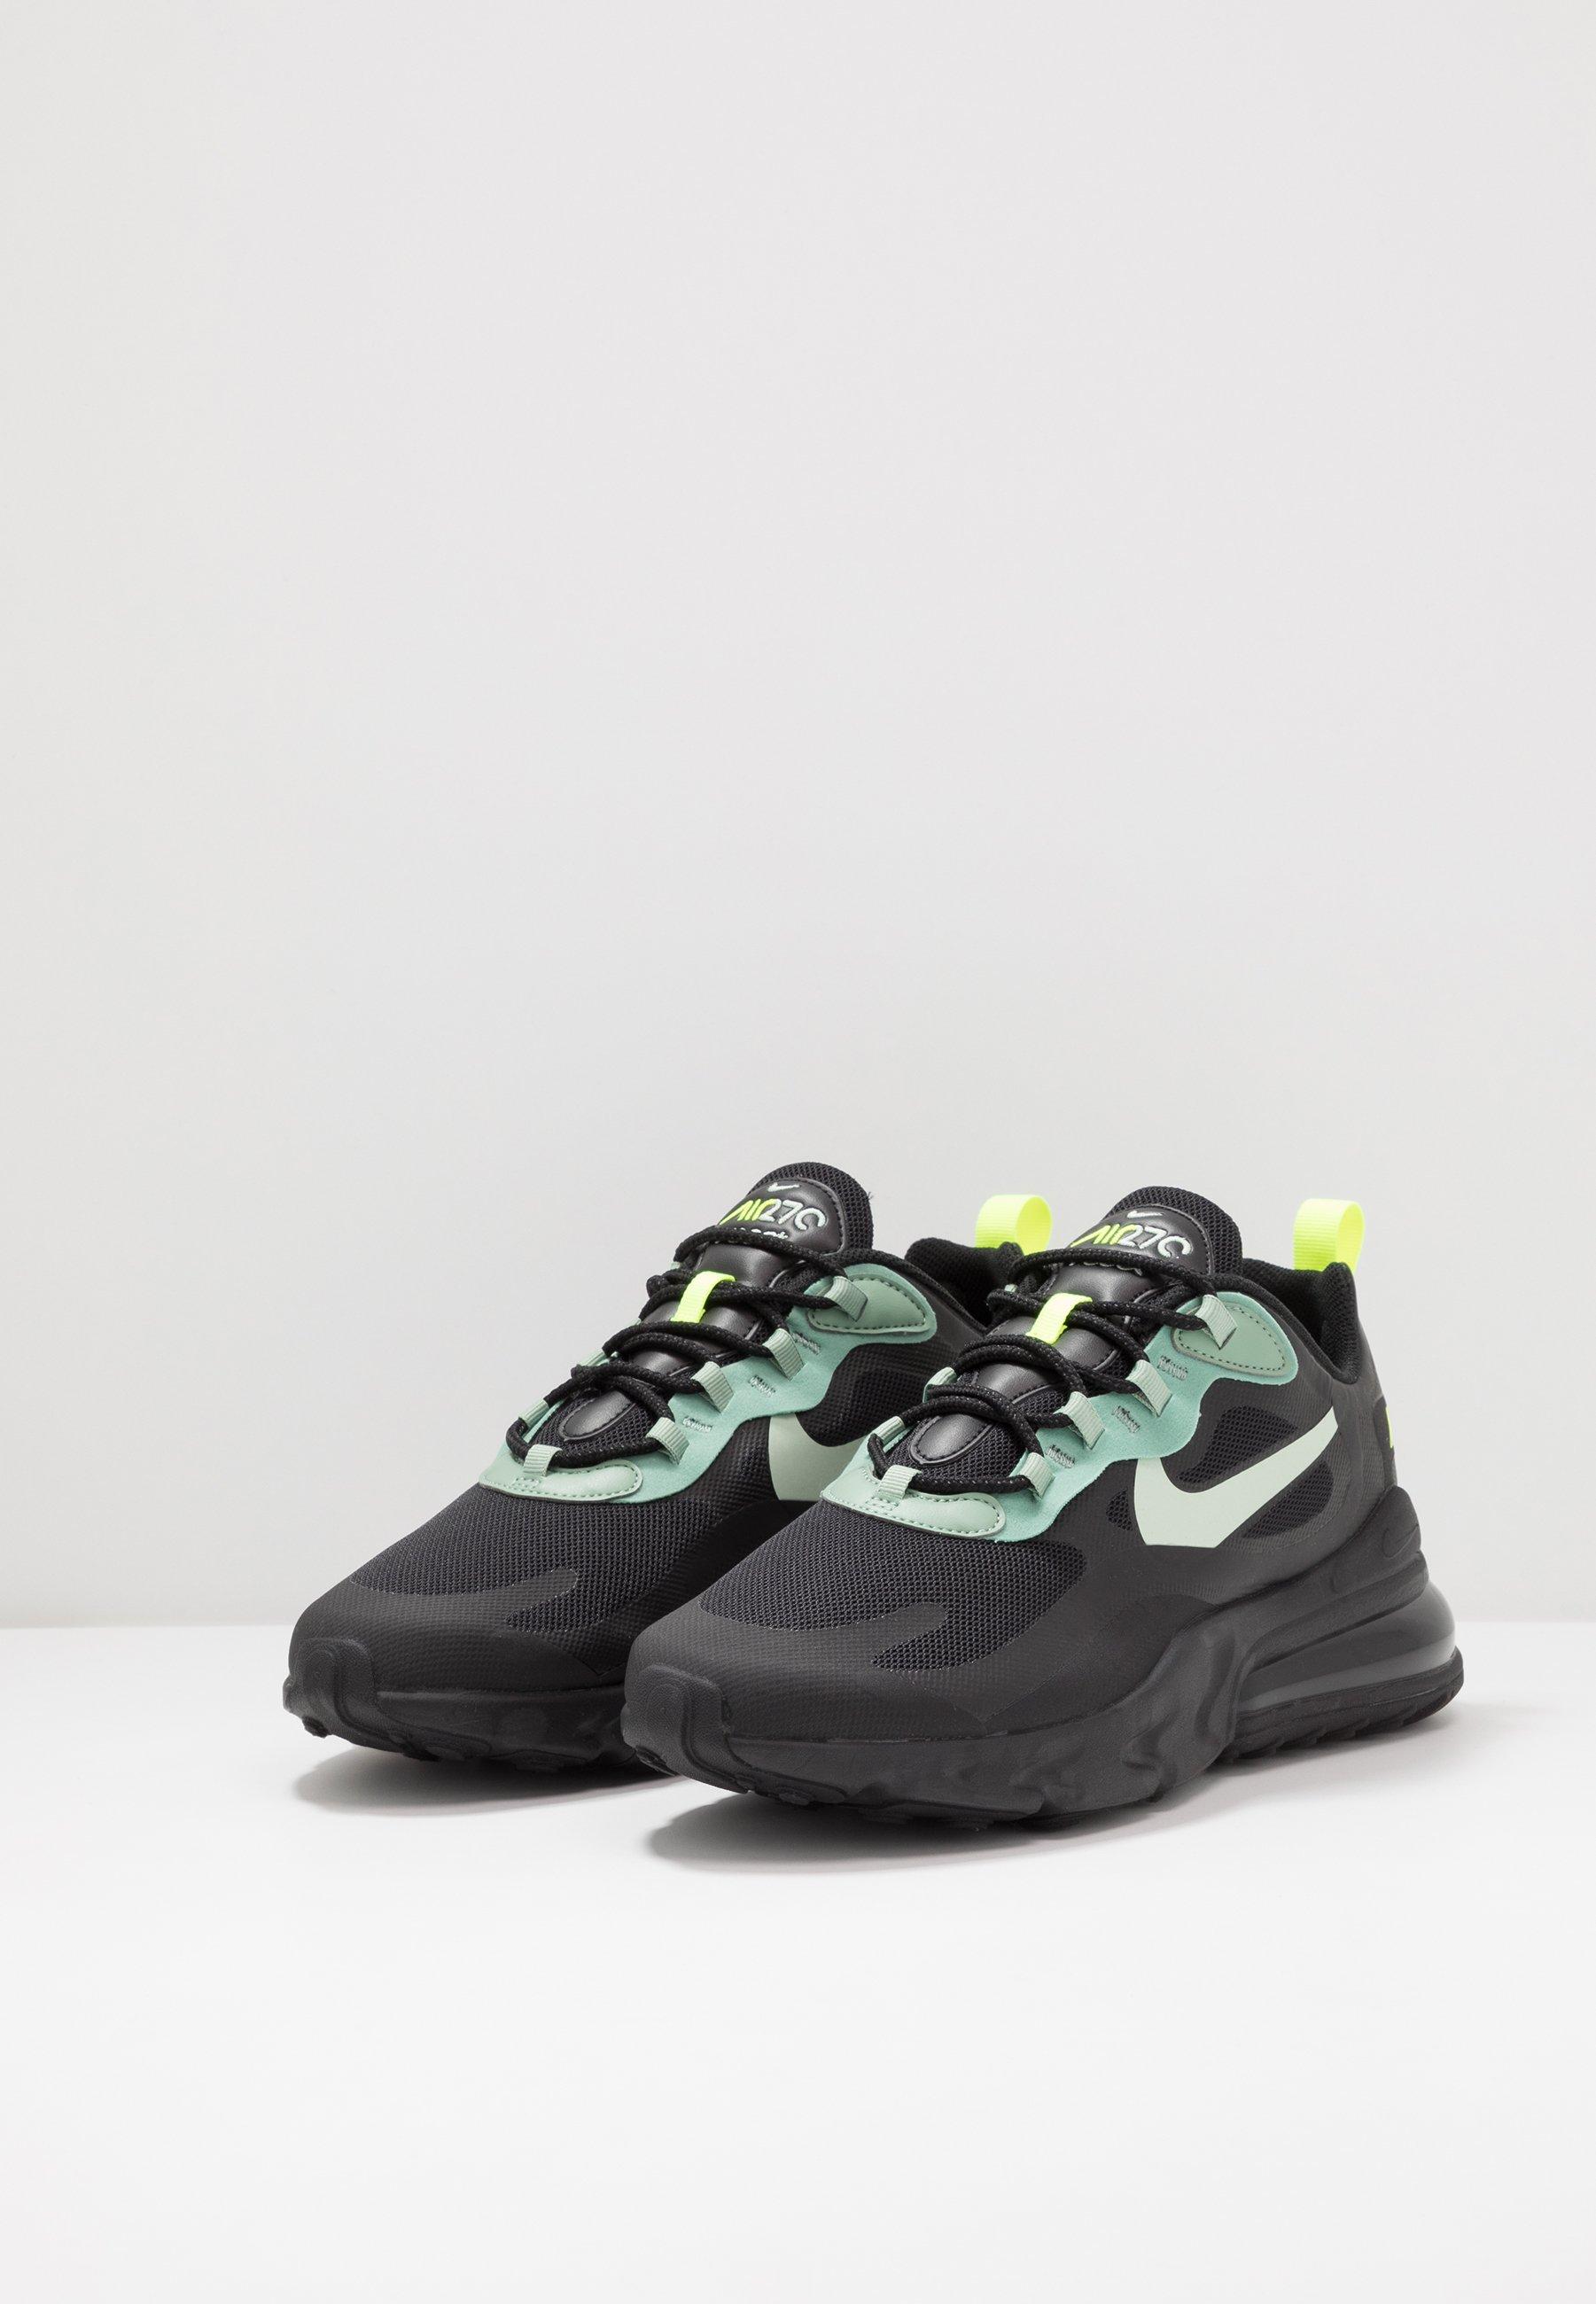 Nike Sportswear Air Max 270 React - Sneakers Black